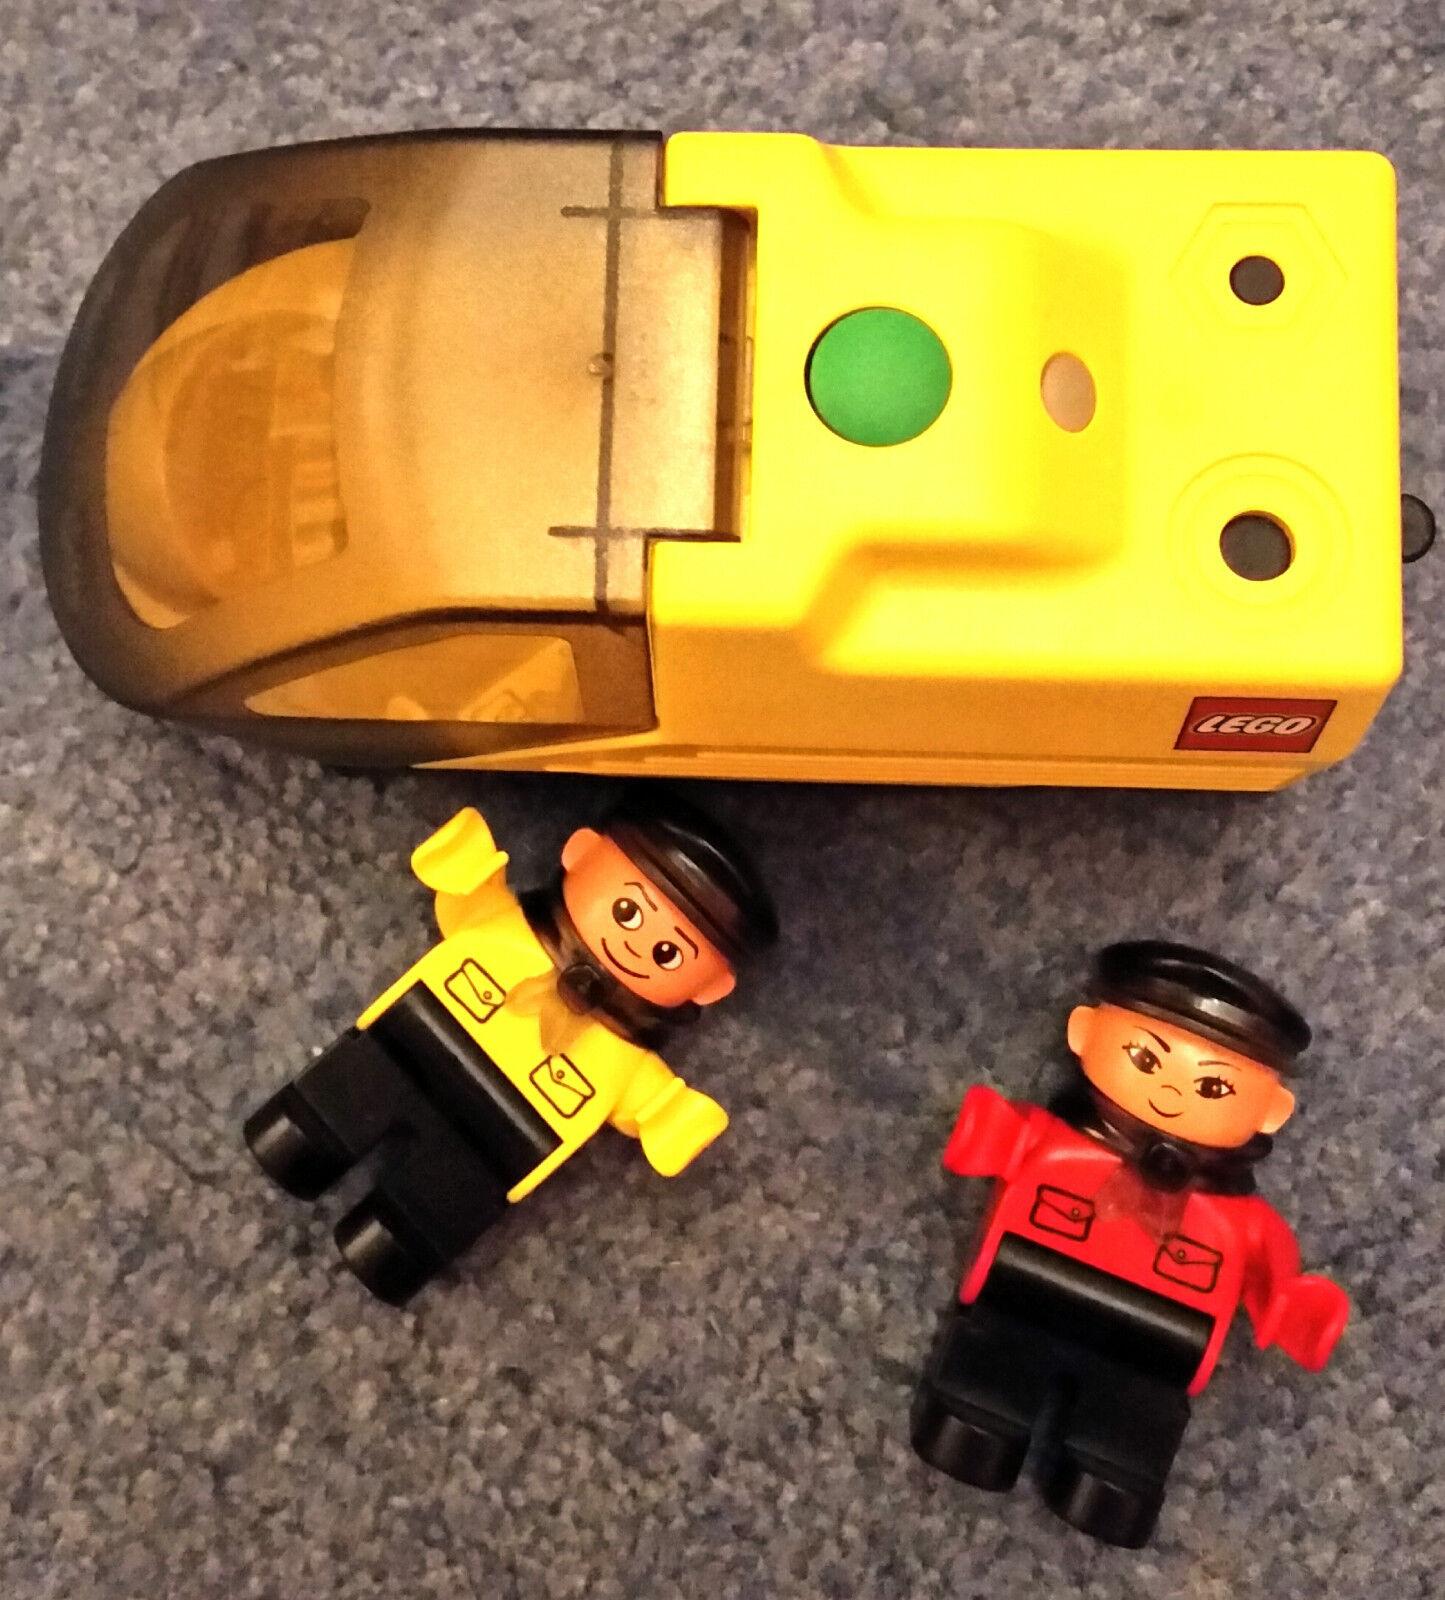 Lego Duplo Explore 3335 + weitere Duplo-Teile